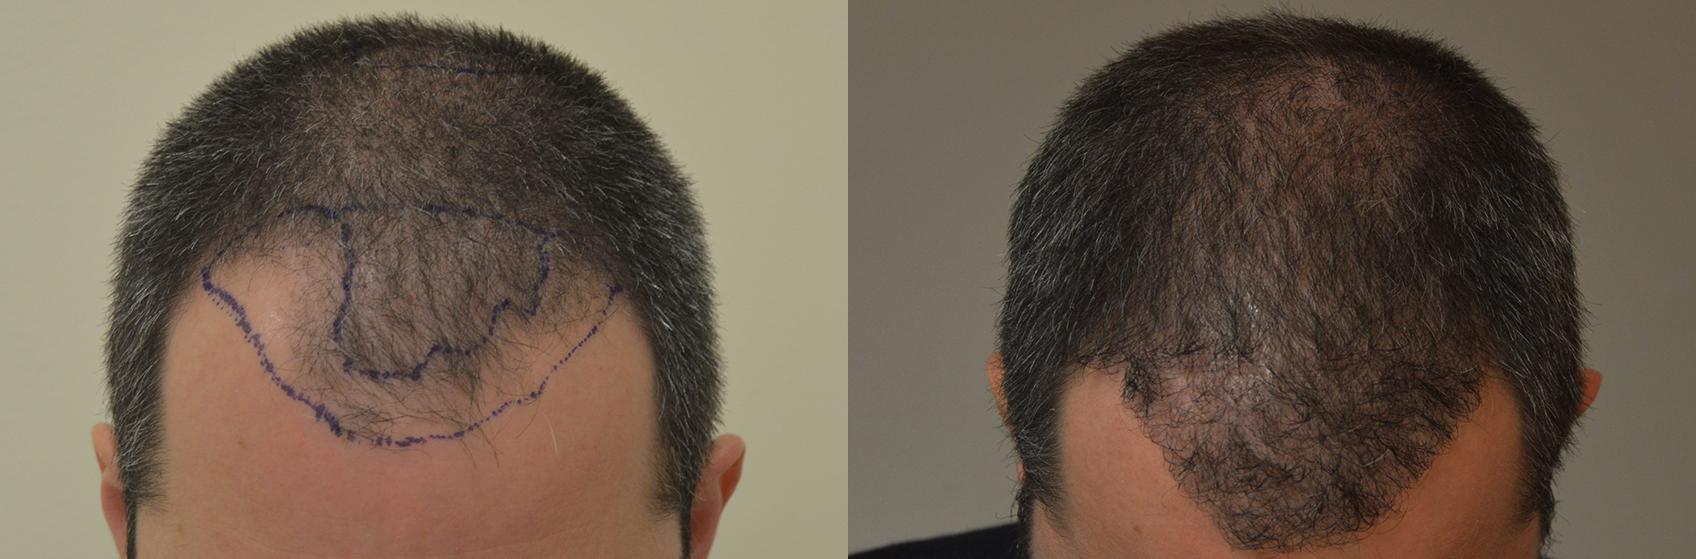 linea-frontale-uomo